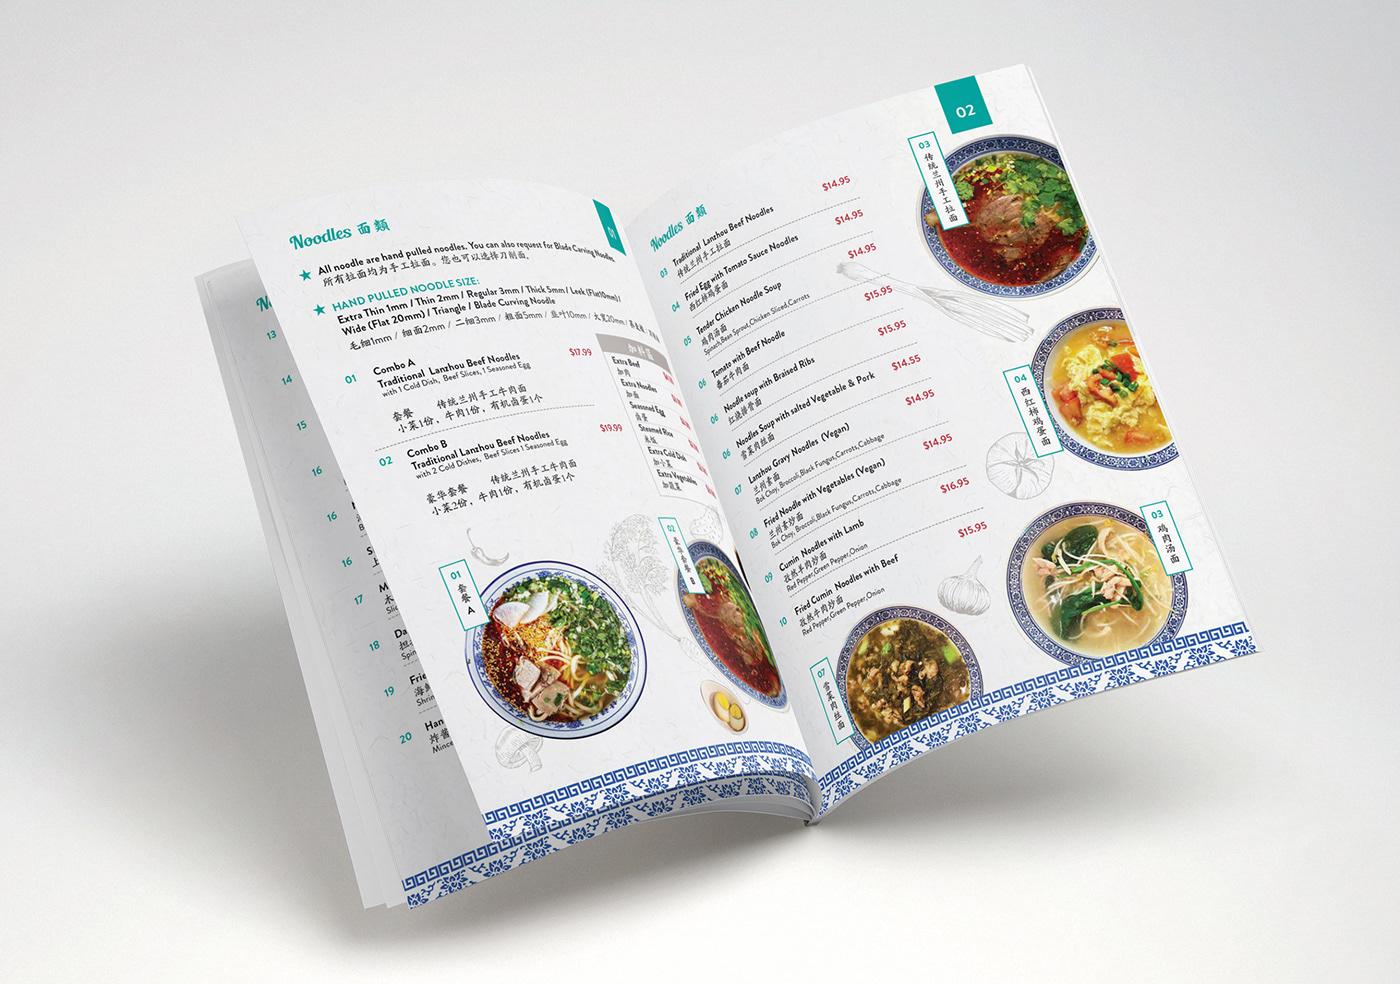 Web Design  menu design video ux UI web development  digital marketing digital design agency wordpress